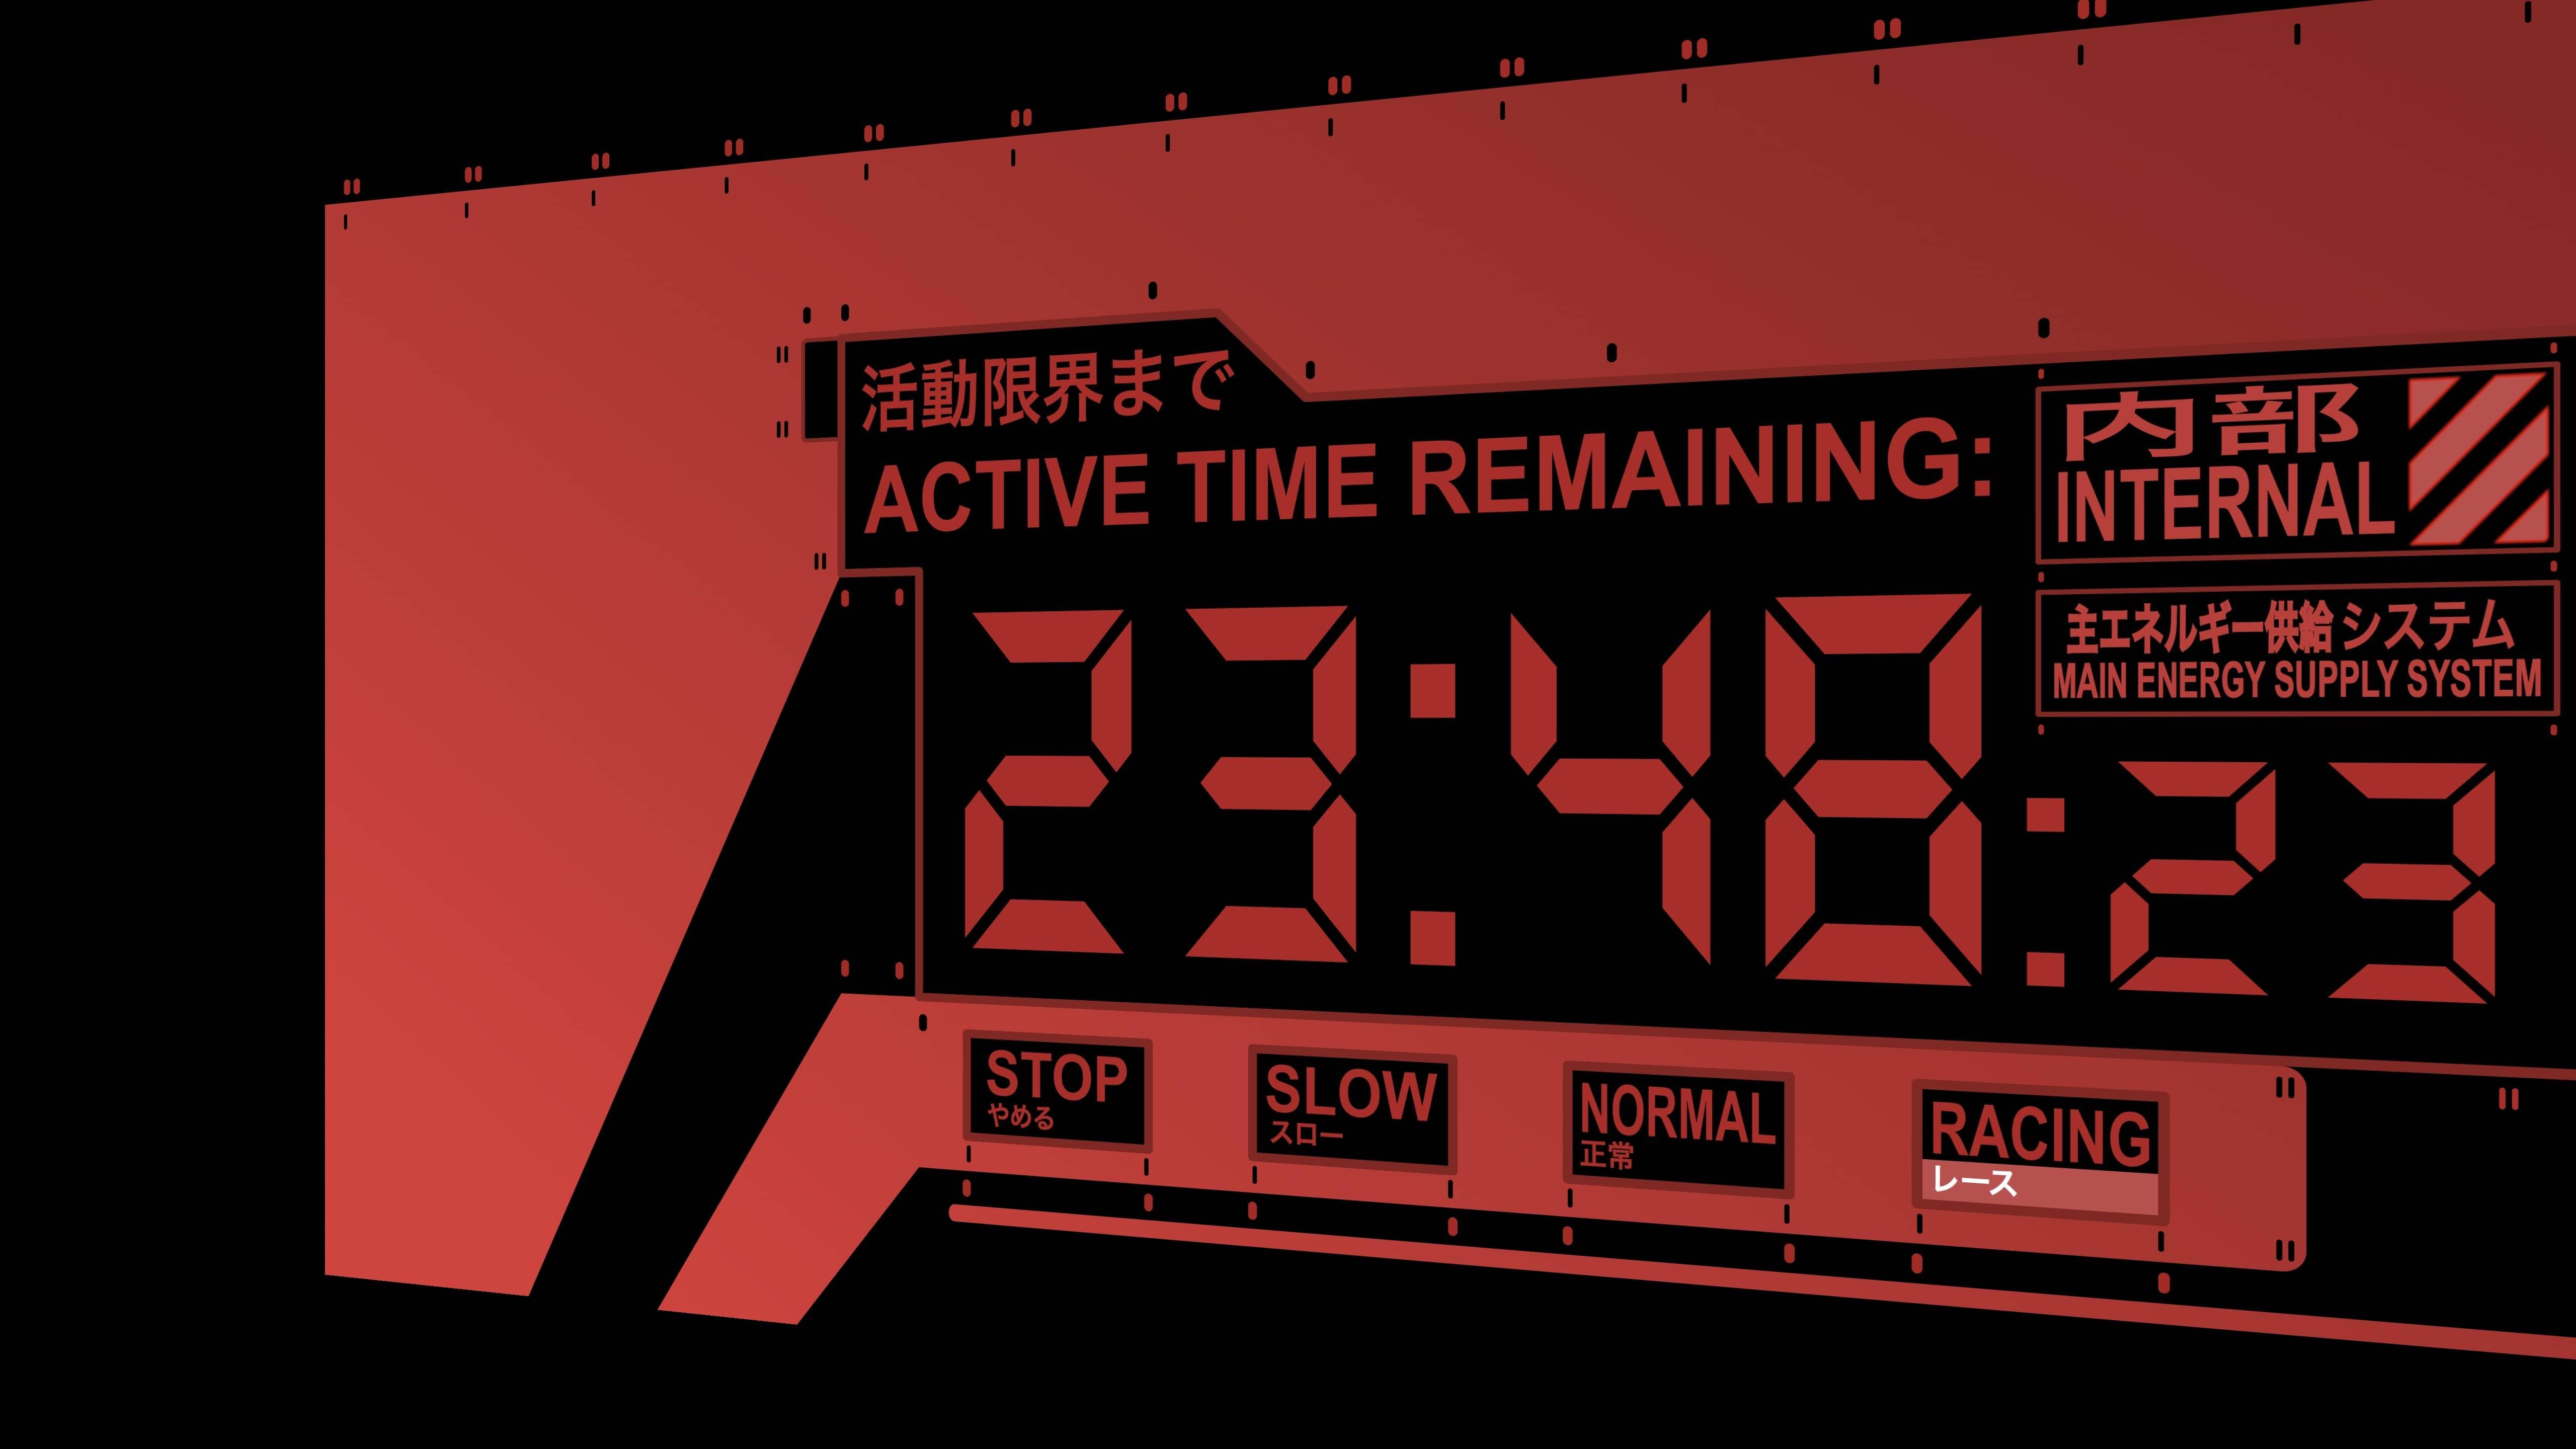 红色风格Simple Clock Screensaver mac屏保